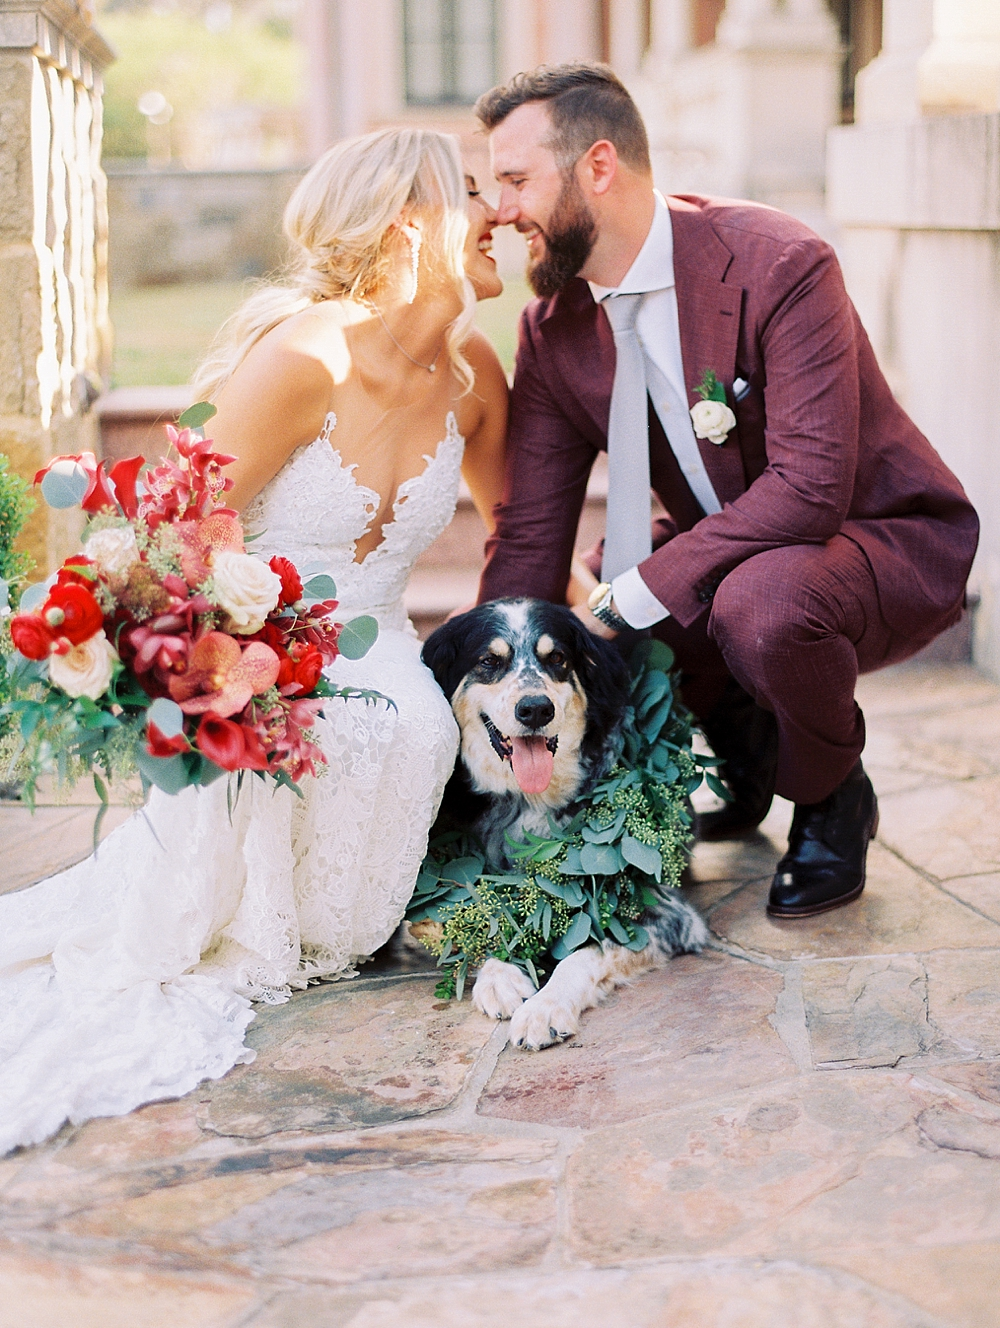 kristin-la-voie-photography-AUSTIN-WEDDING-PHOTOGRAPHER-BEST-IN-TEXAS-10